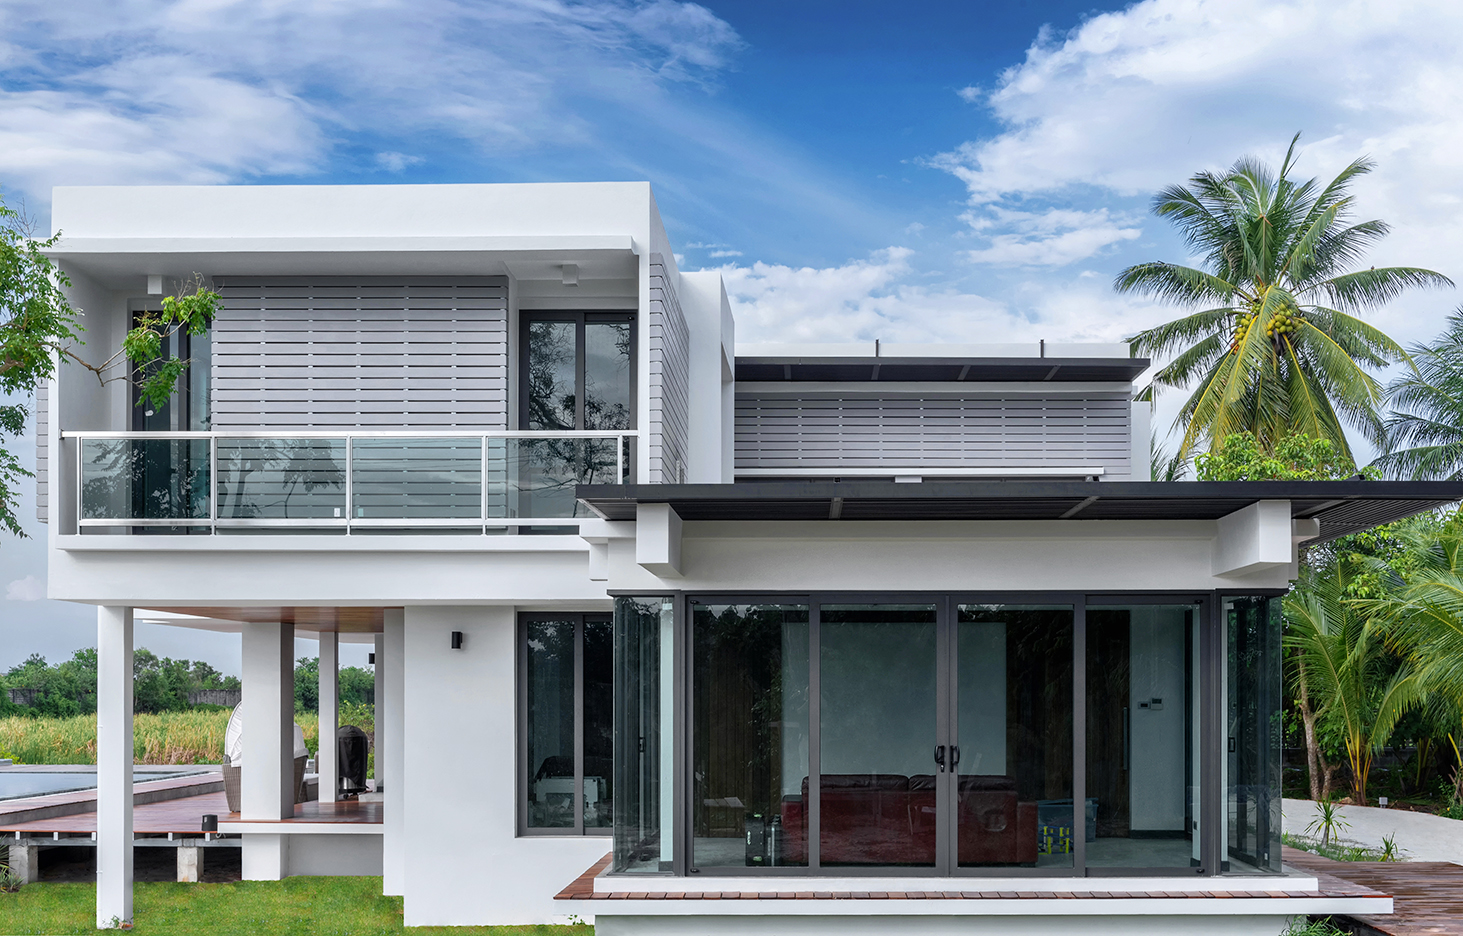 10design uthai residence house design modern architecture pattani thailand swimming pool 06